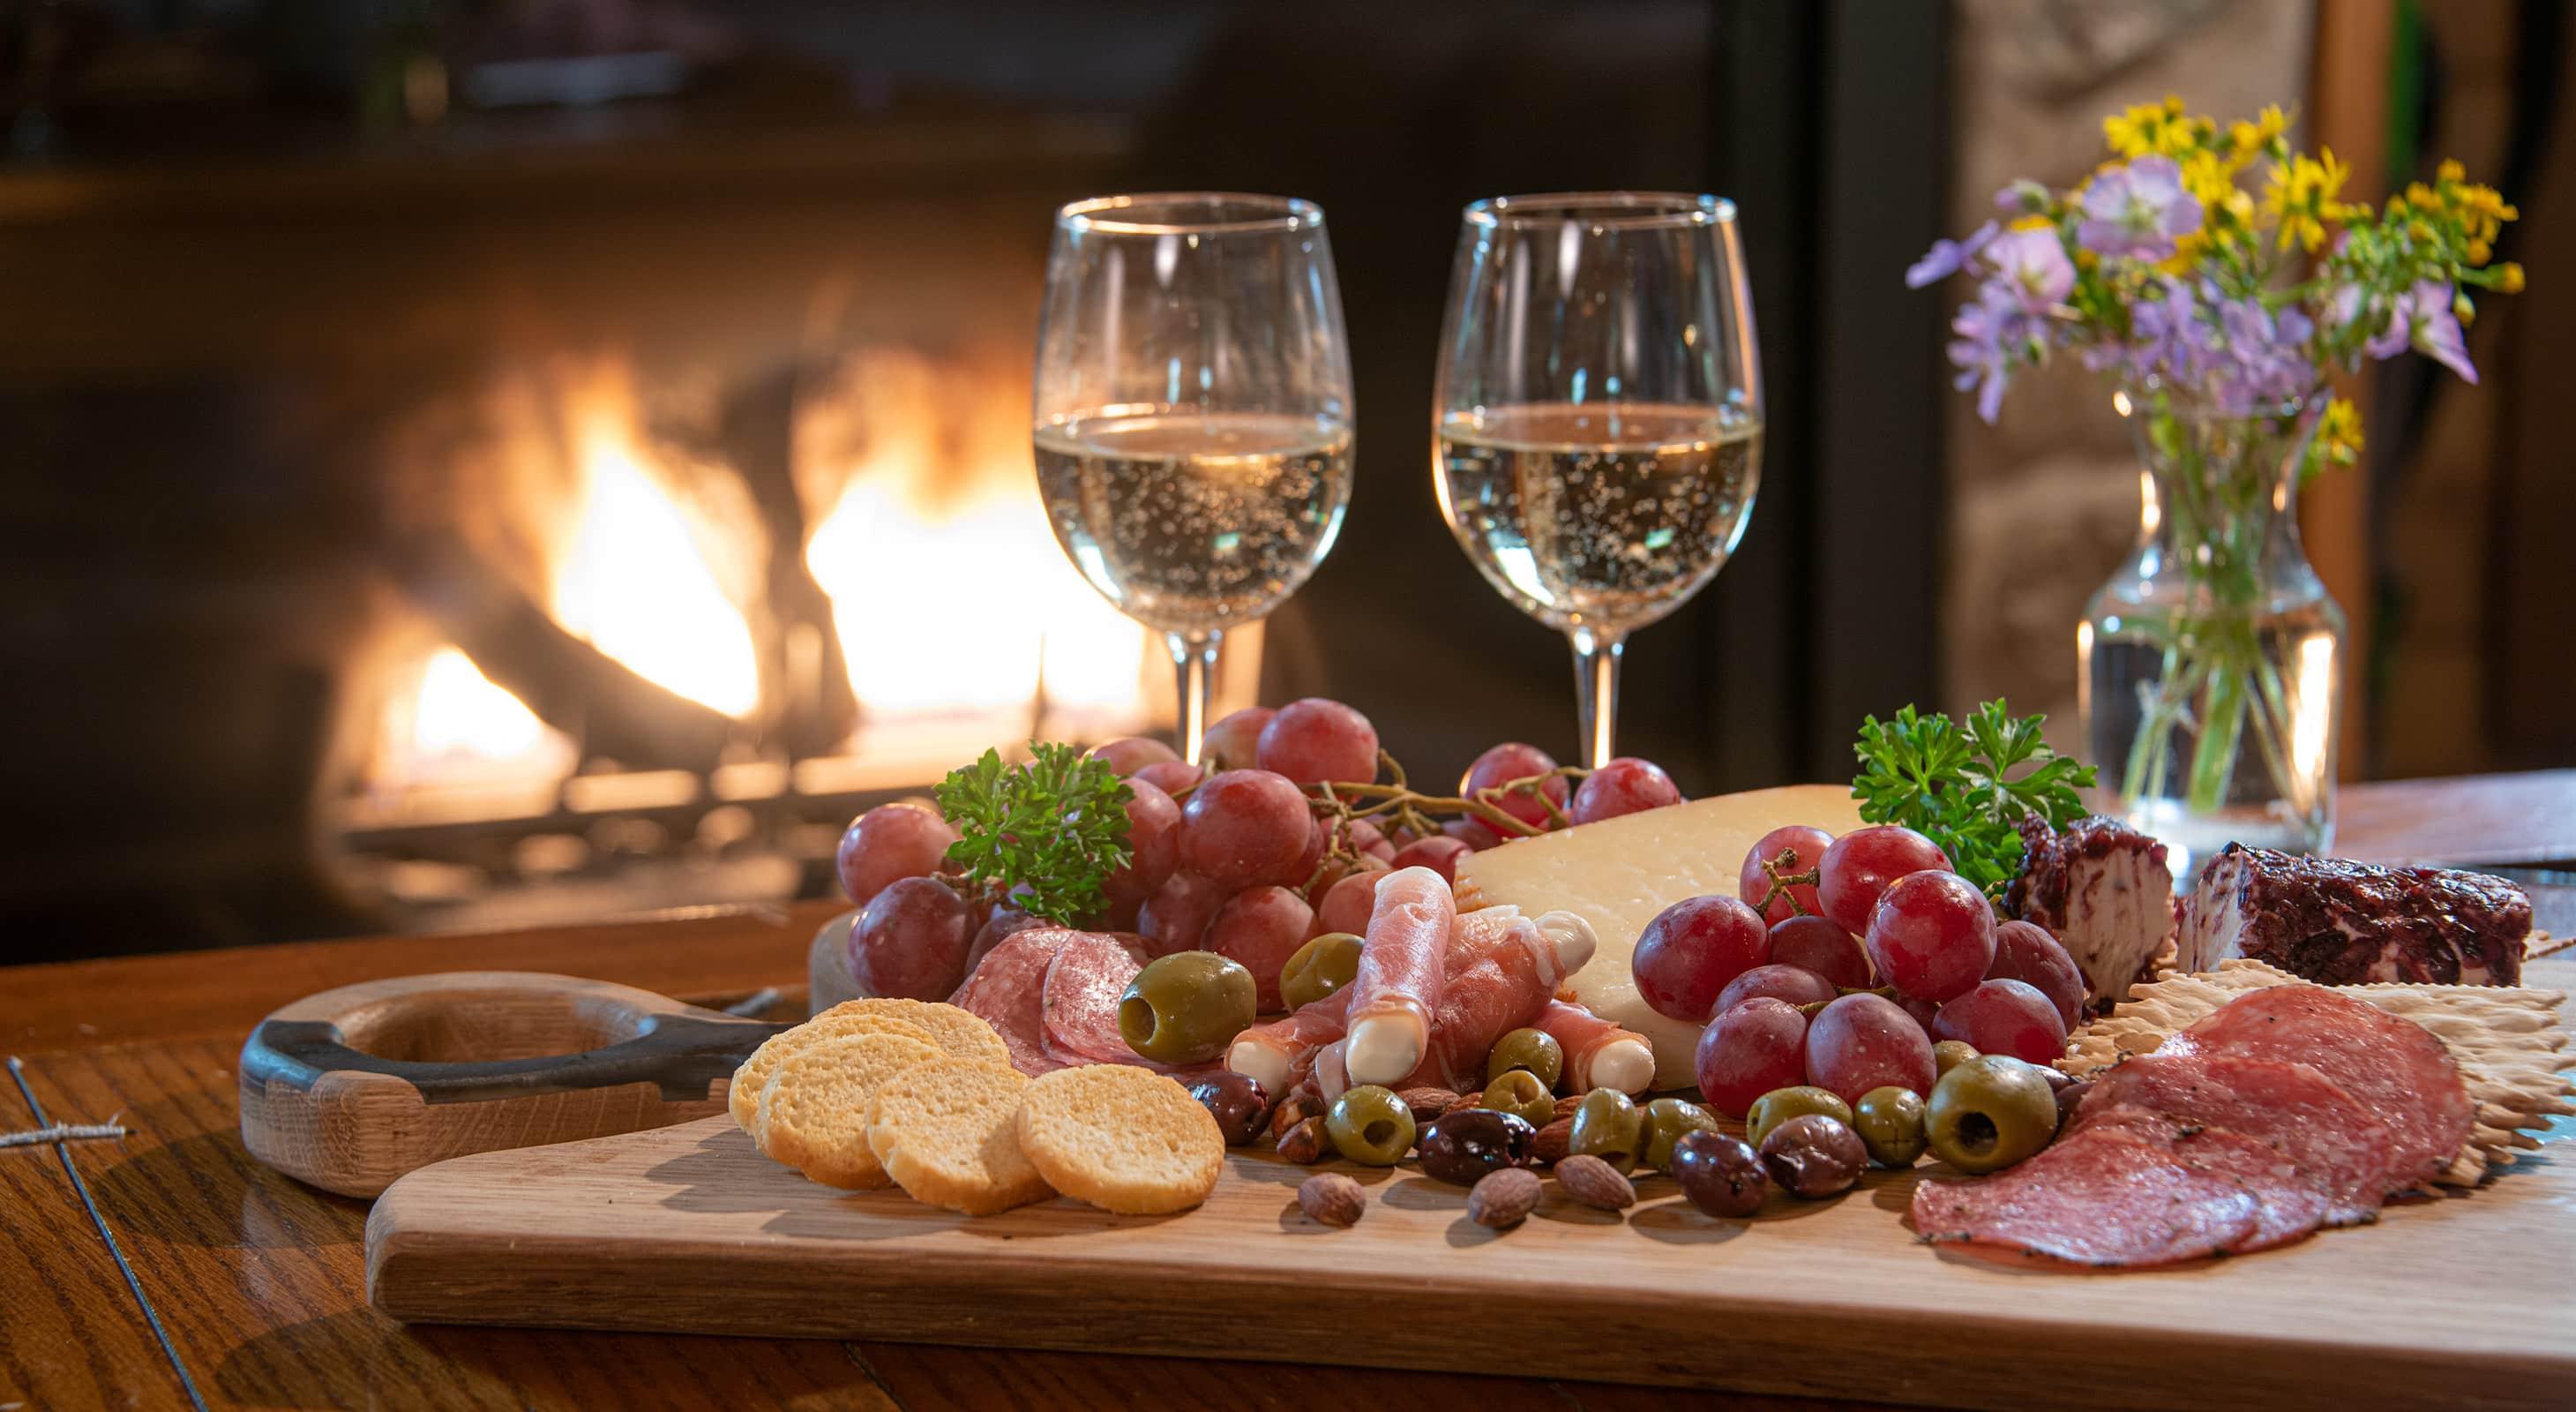 charcuterie board and wine for a romantic Illinois cabin getaway